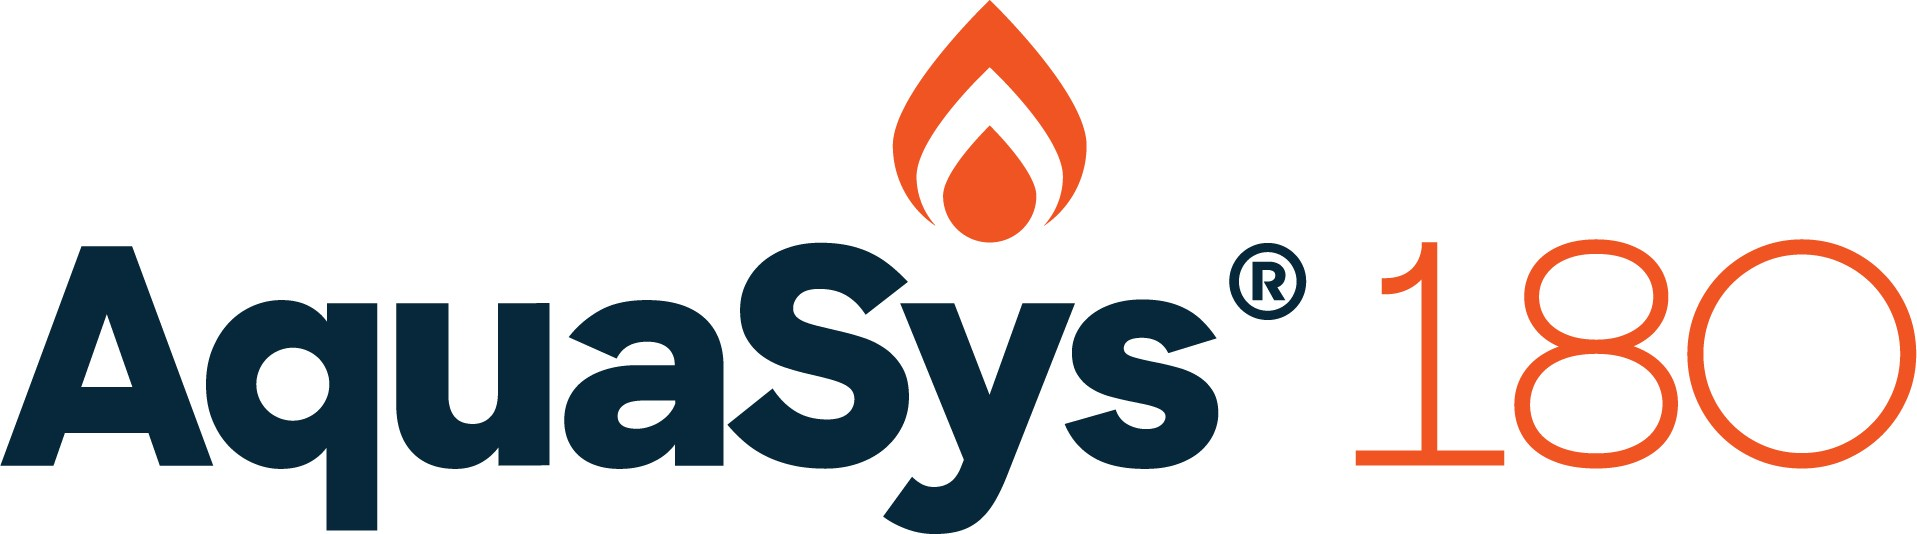 Aquasys 180 Logo